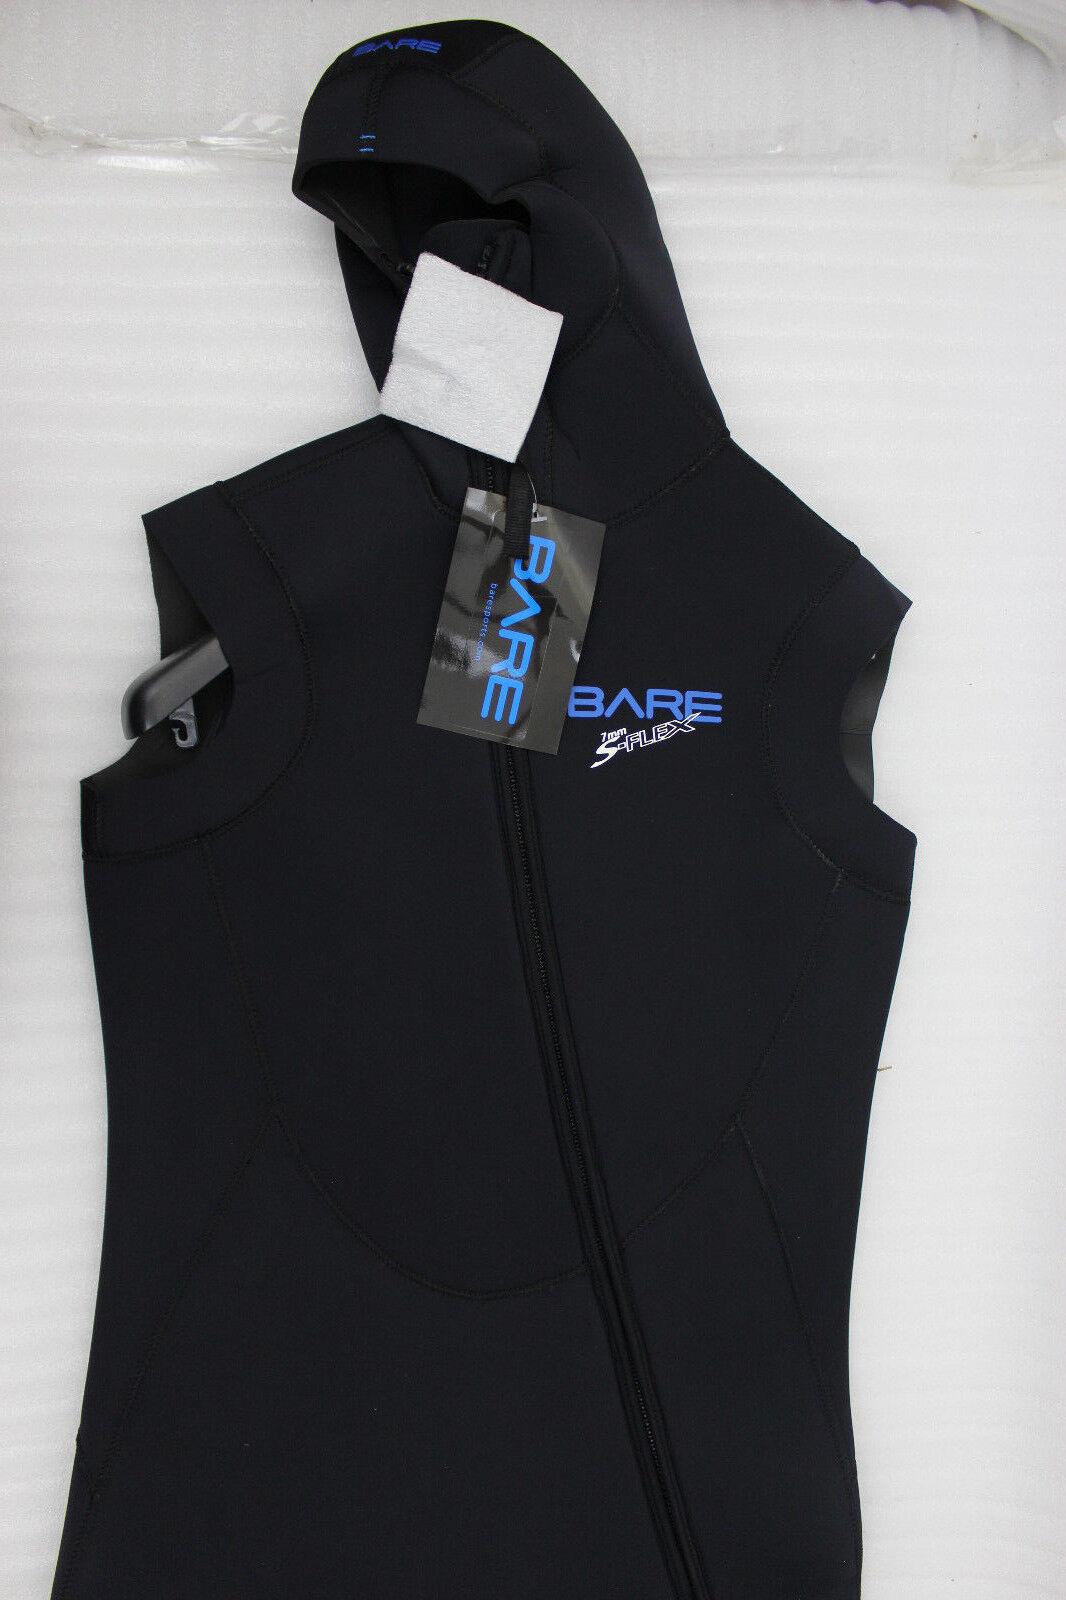 Bare S Flex Full 7mm Diving Vest Step-In Hooded Vest zwart One XL nieuwe A